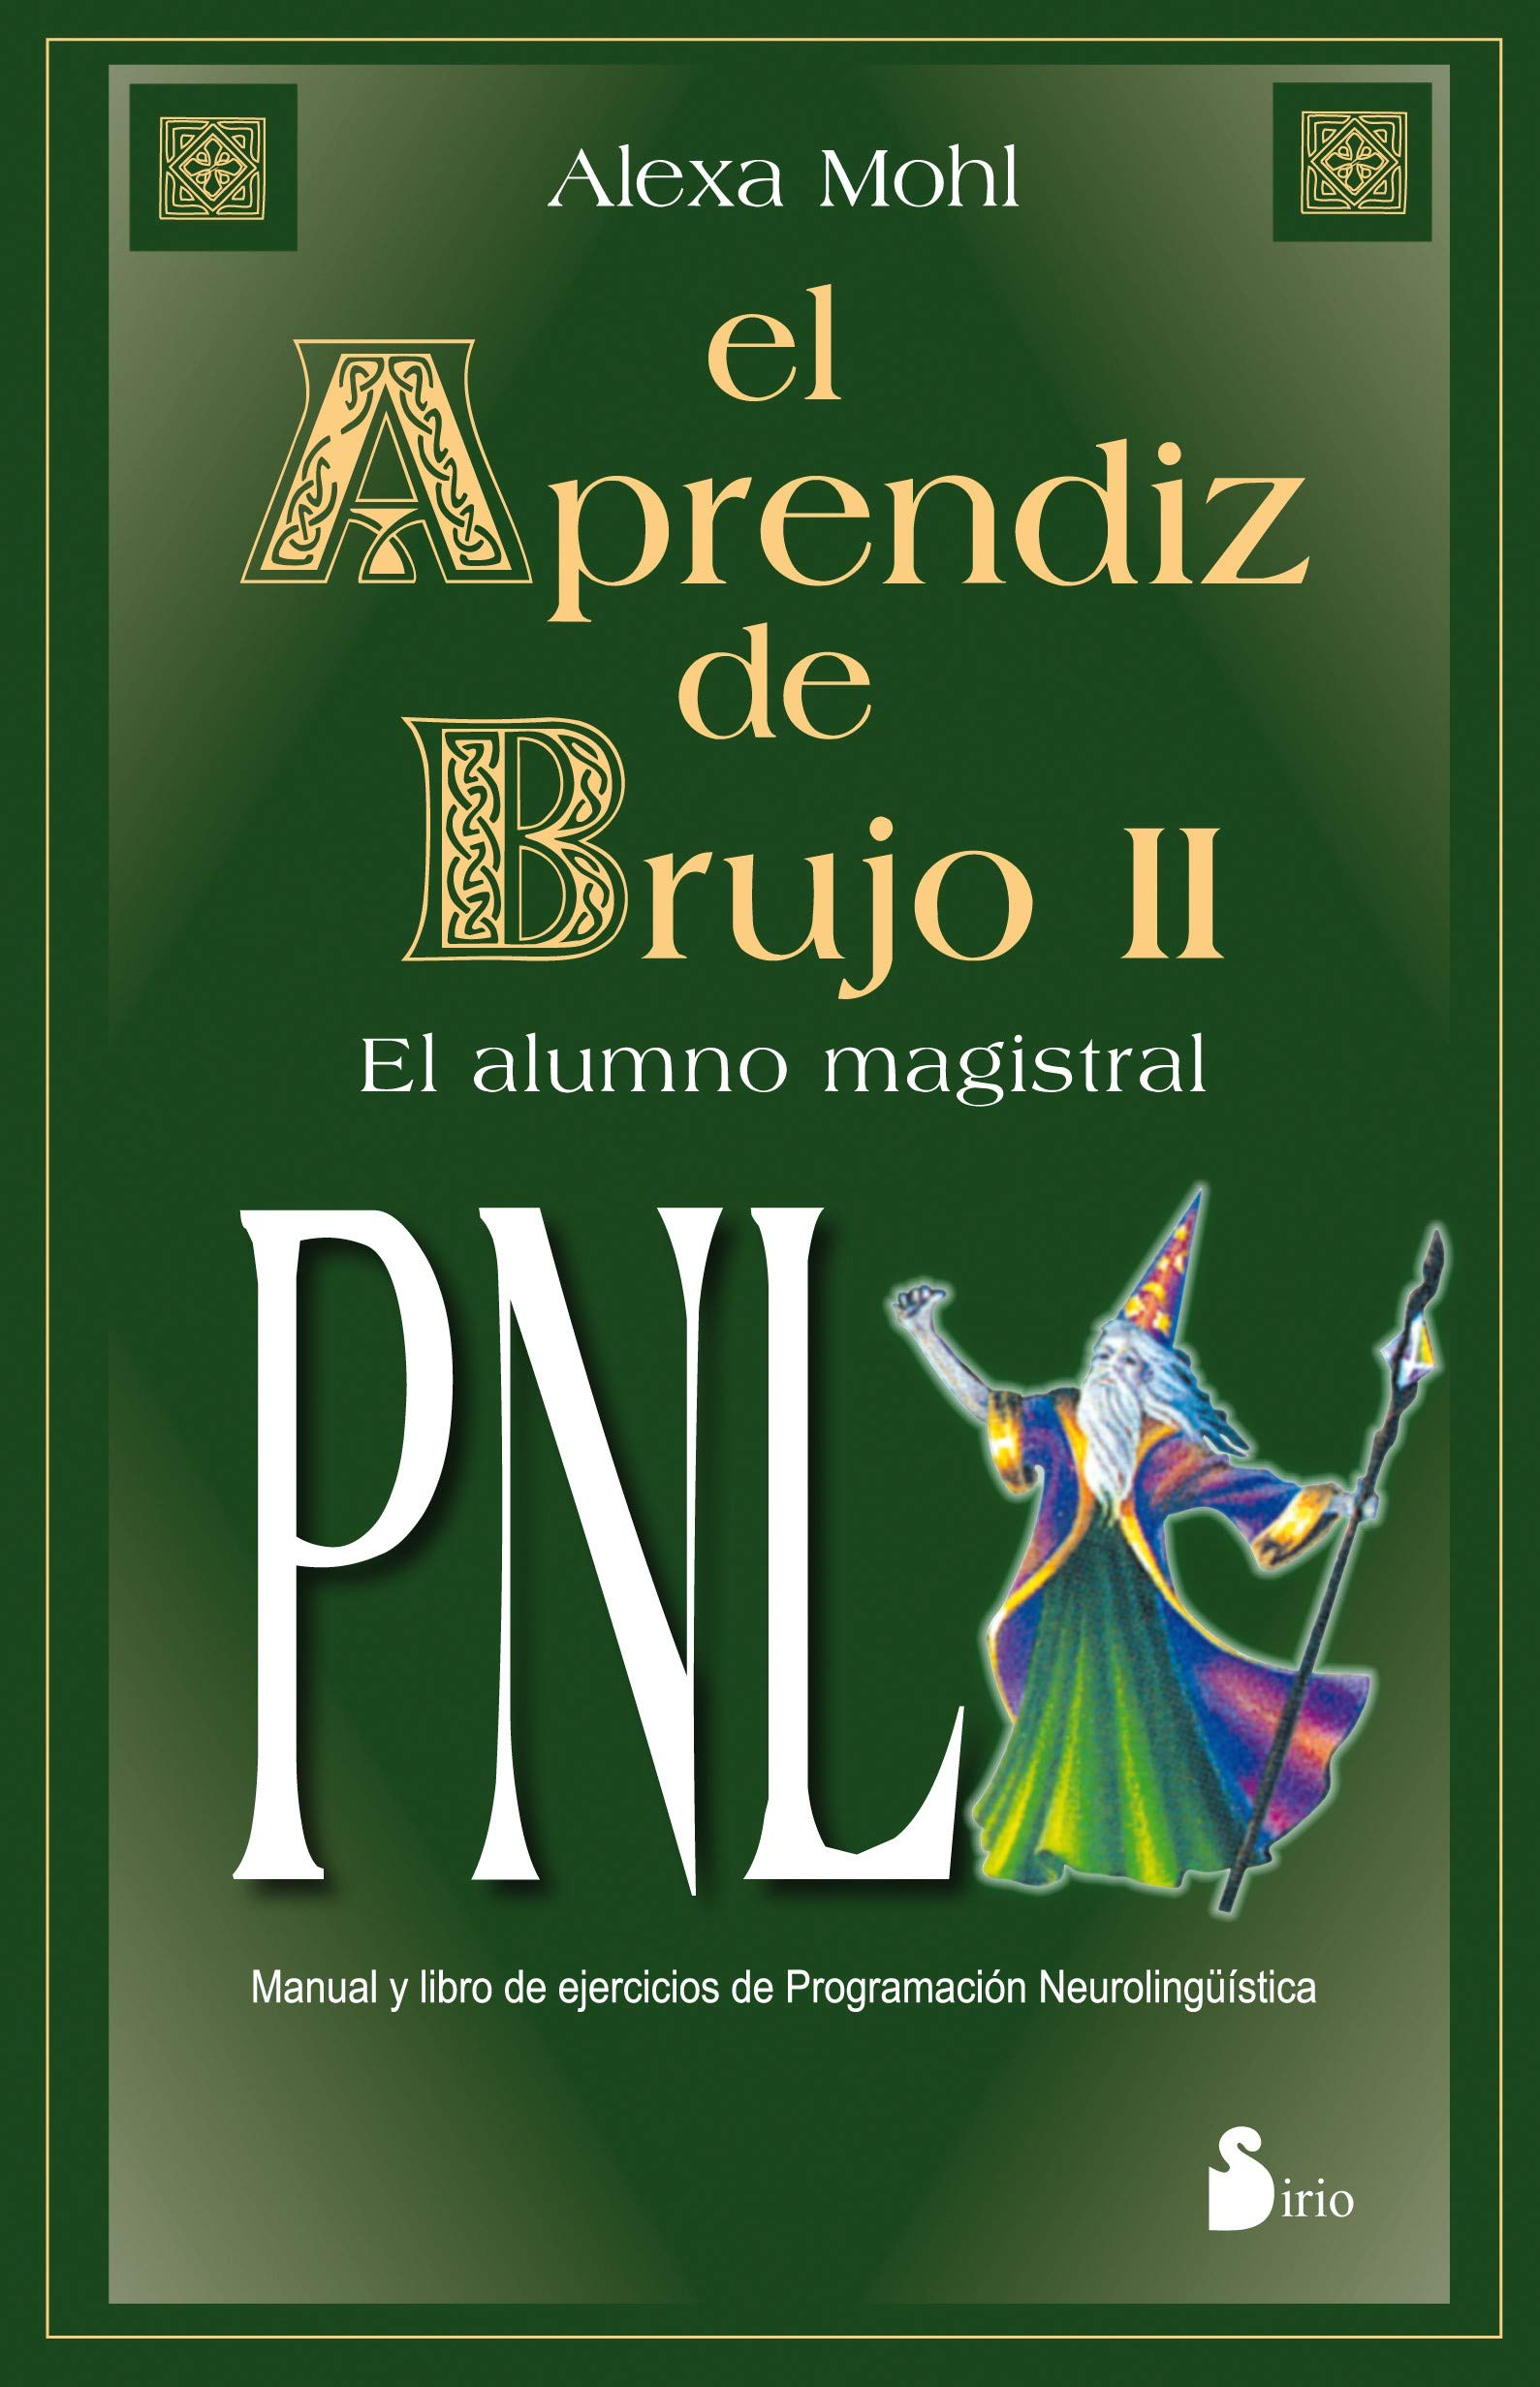 El aprendiz de brujo II. PNL (Spanish Edition) (Spanish) Paperback –  October 11, 2005